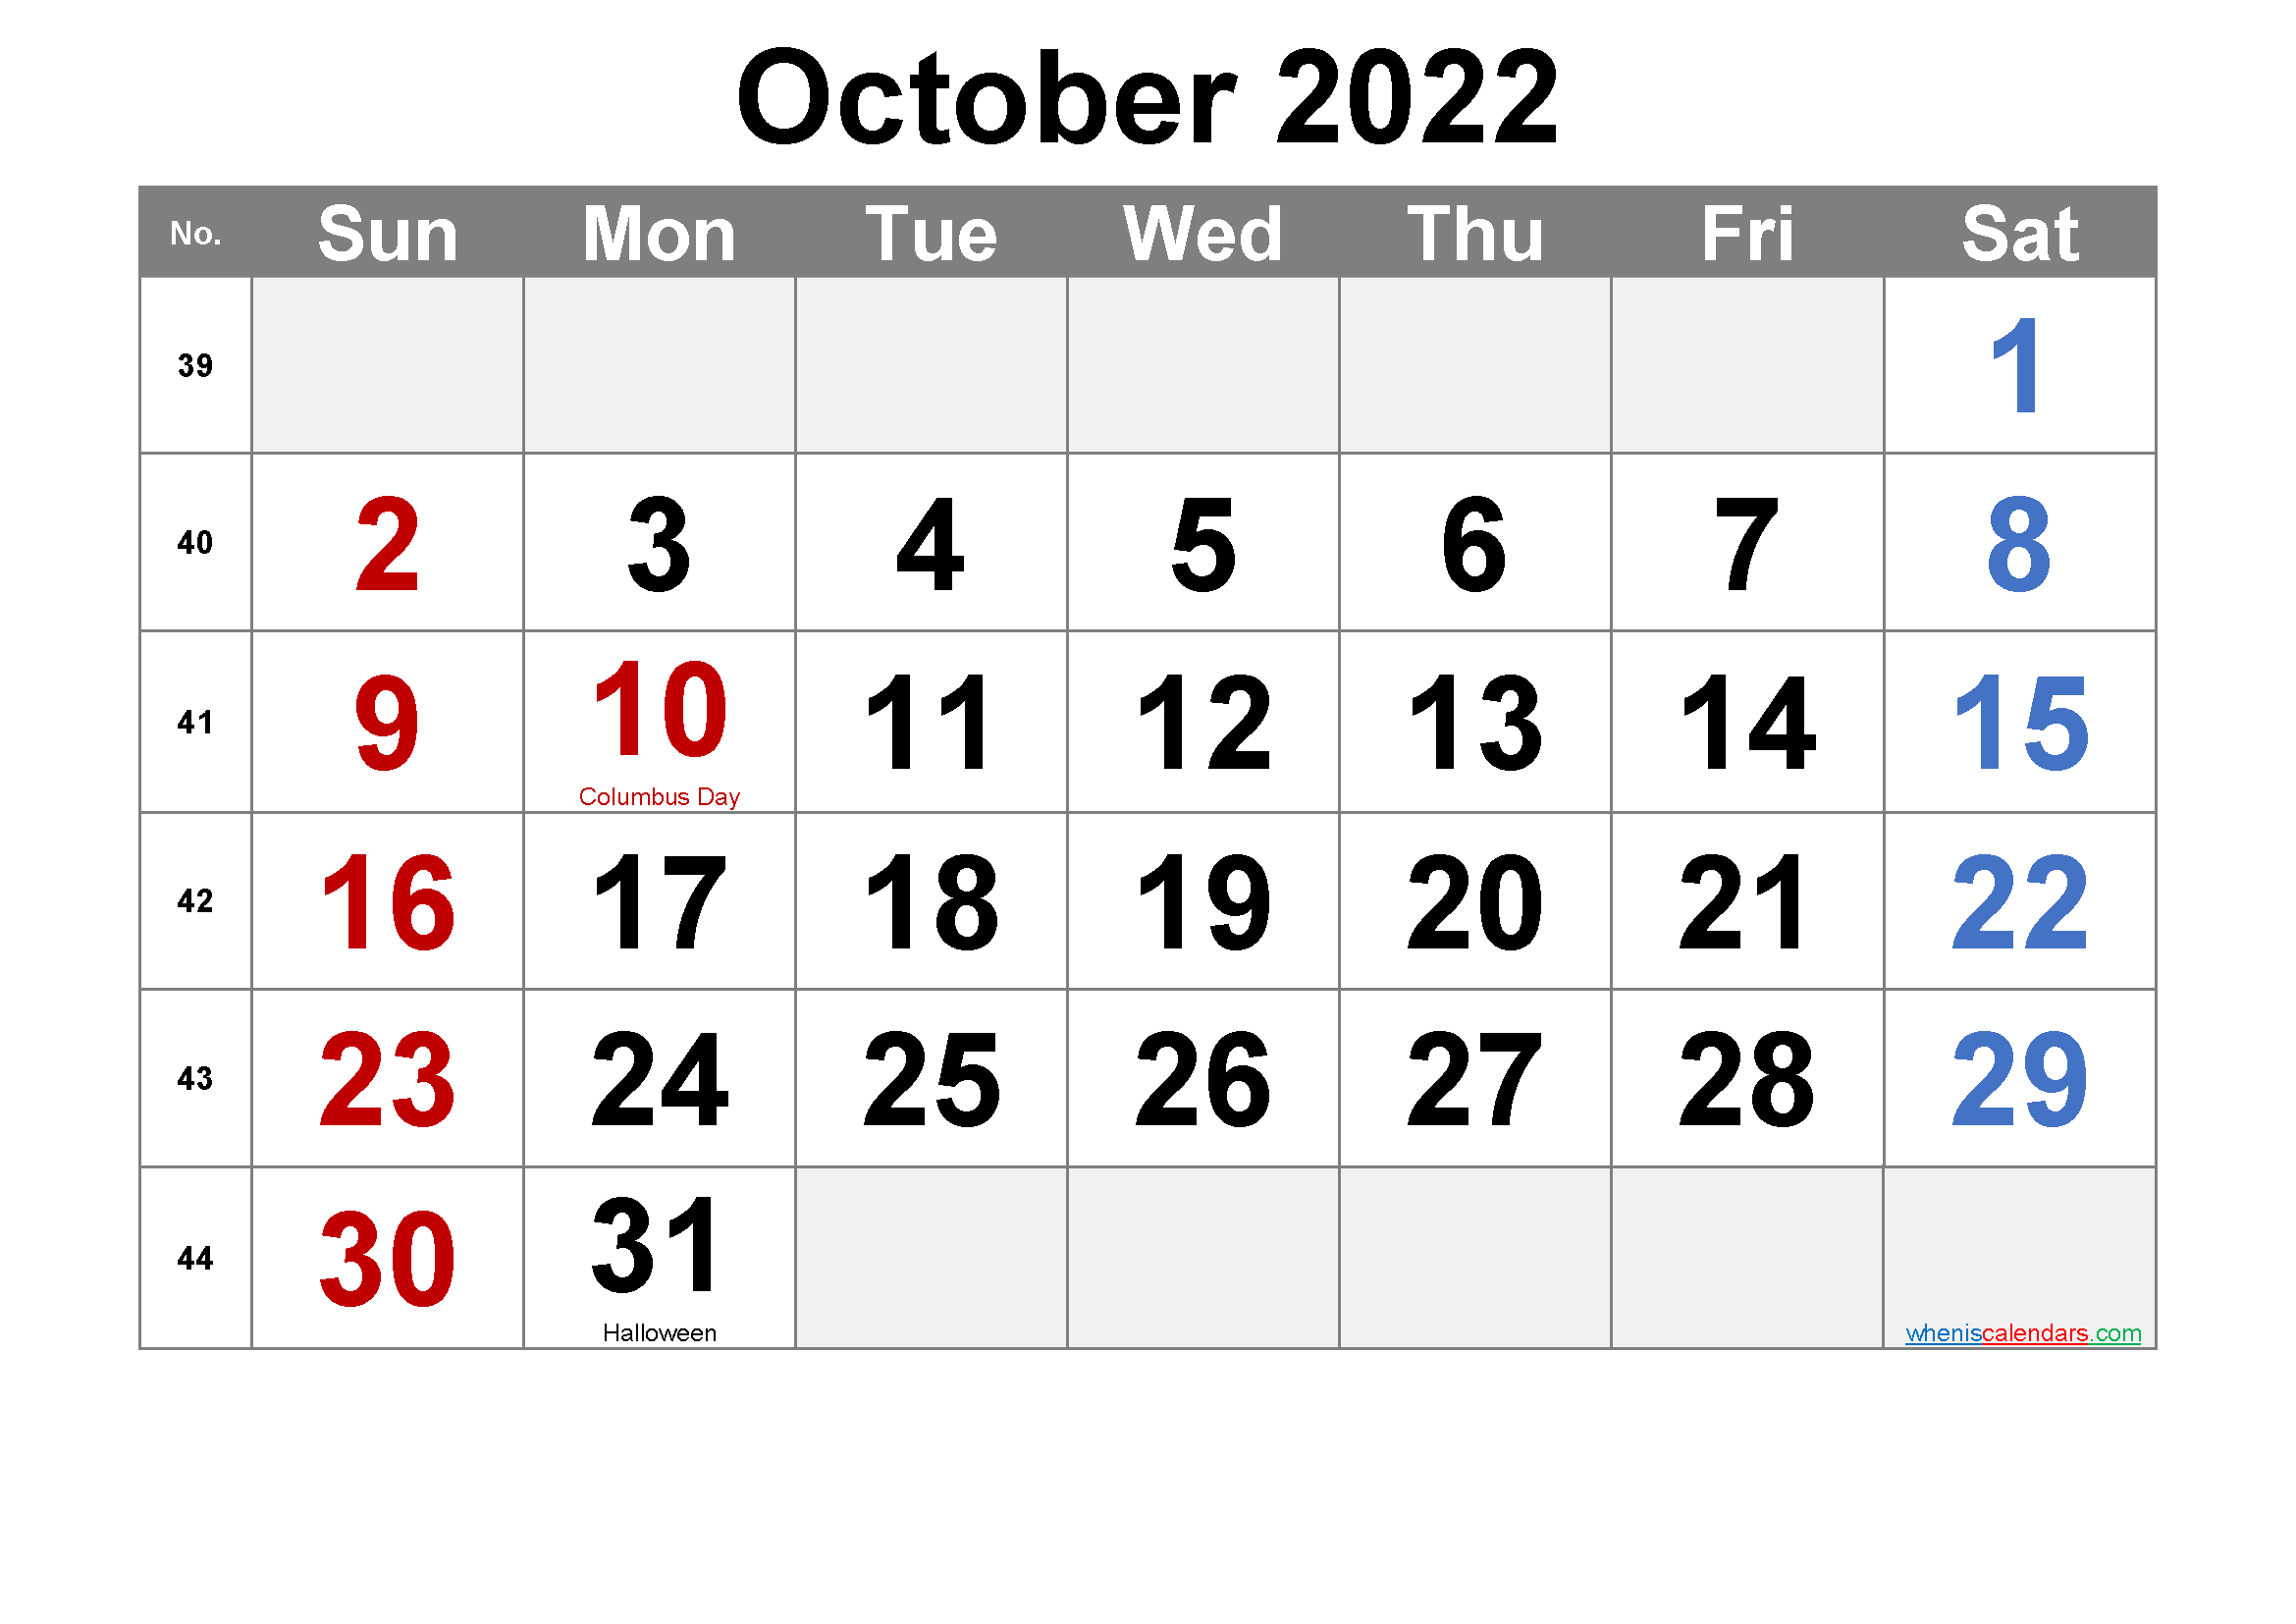 October 2022 Printable Calendar with Holidays